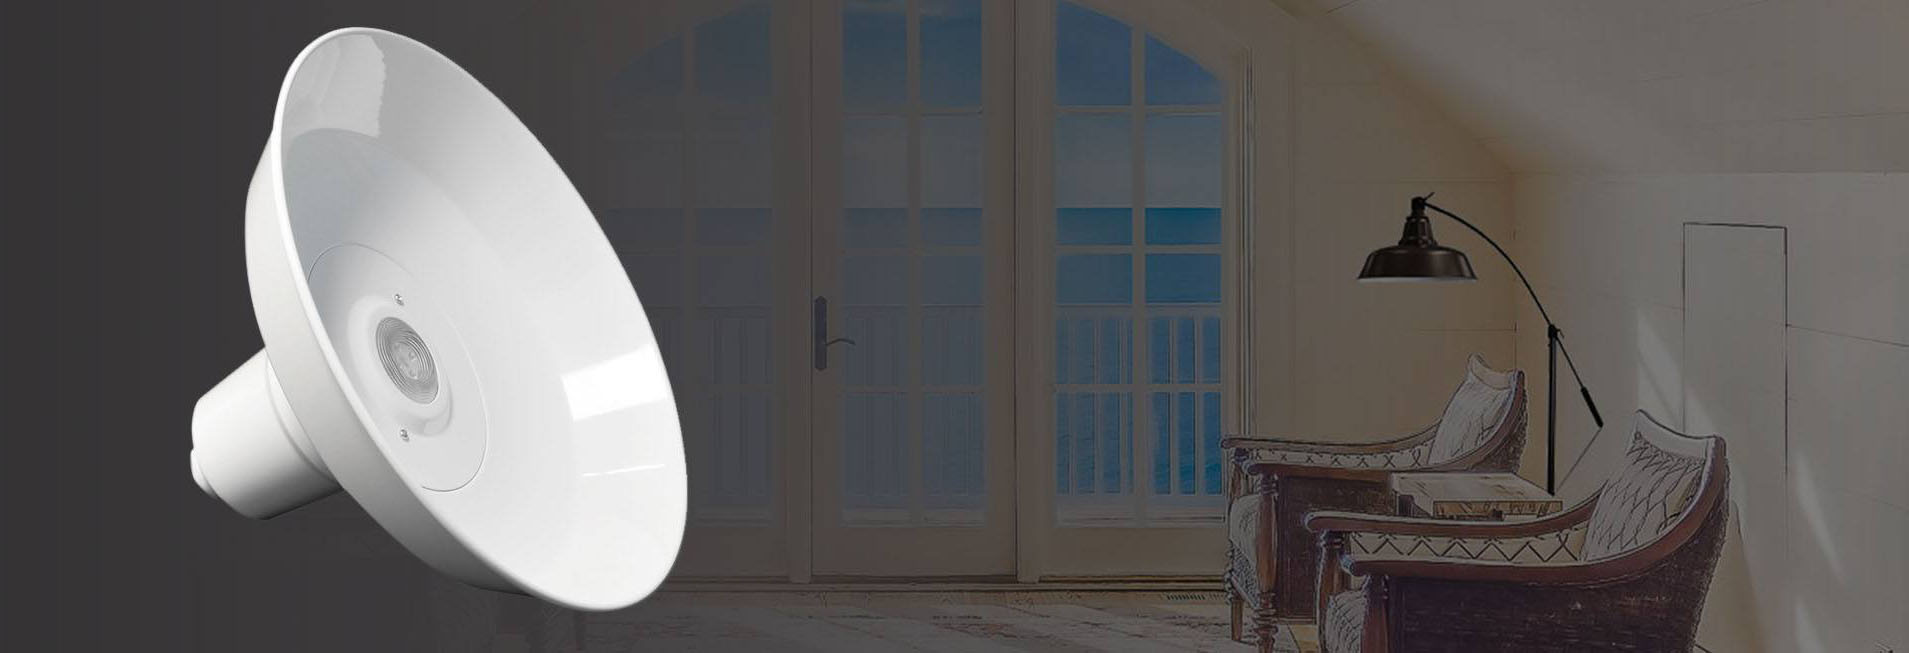 Goodyear LED Floor Lamp adjustable